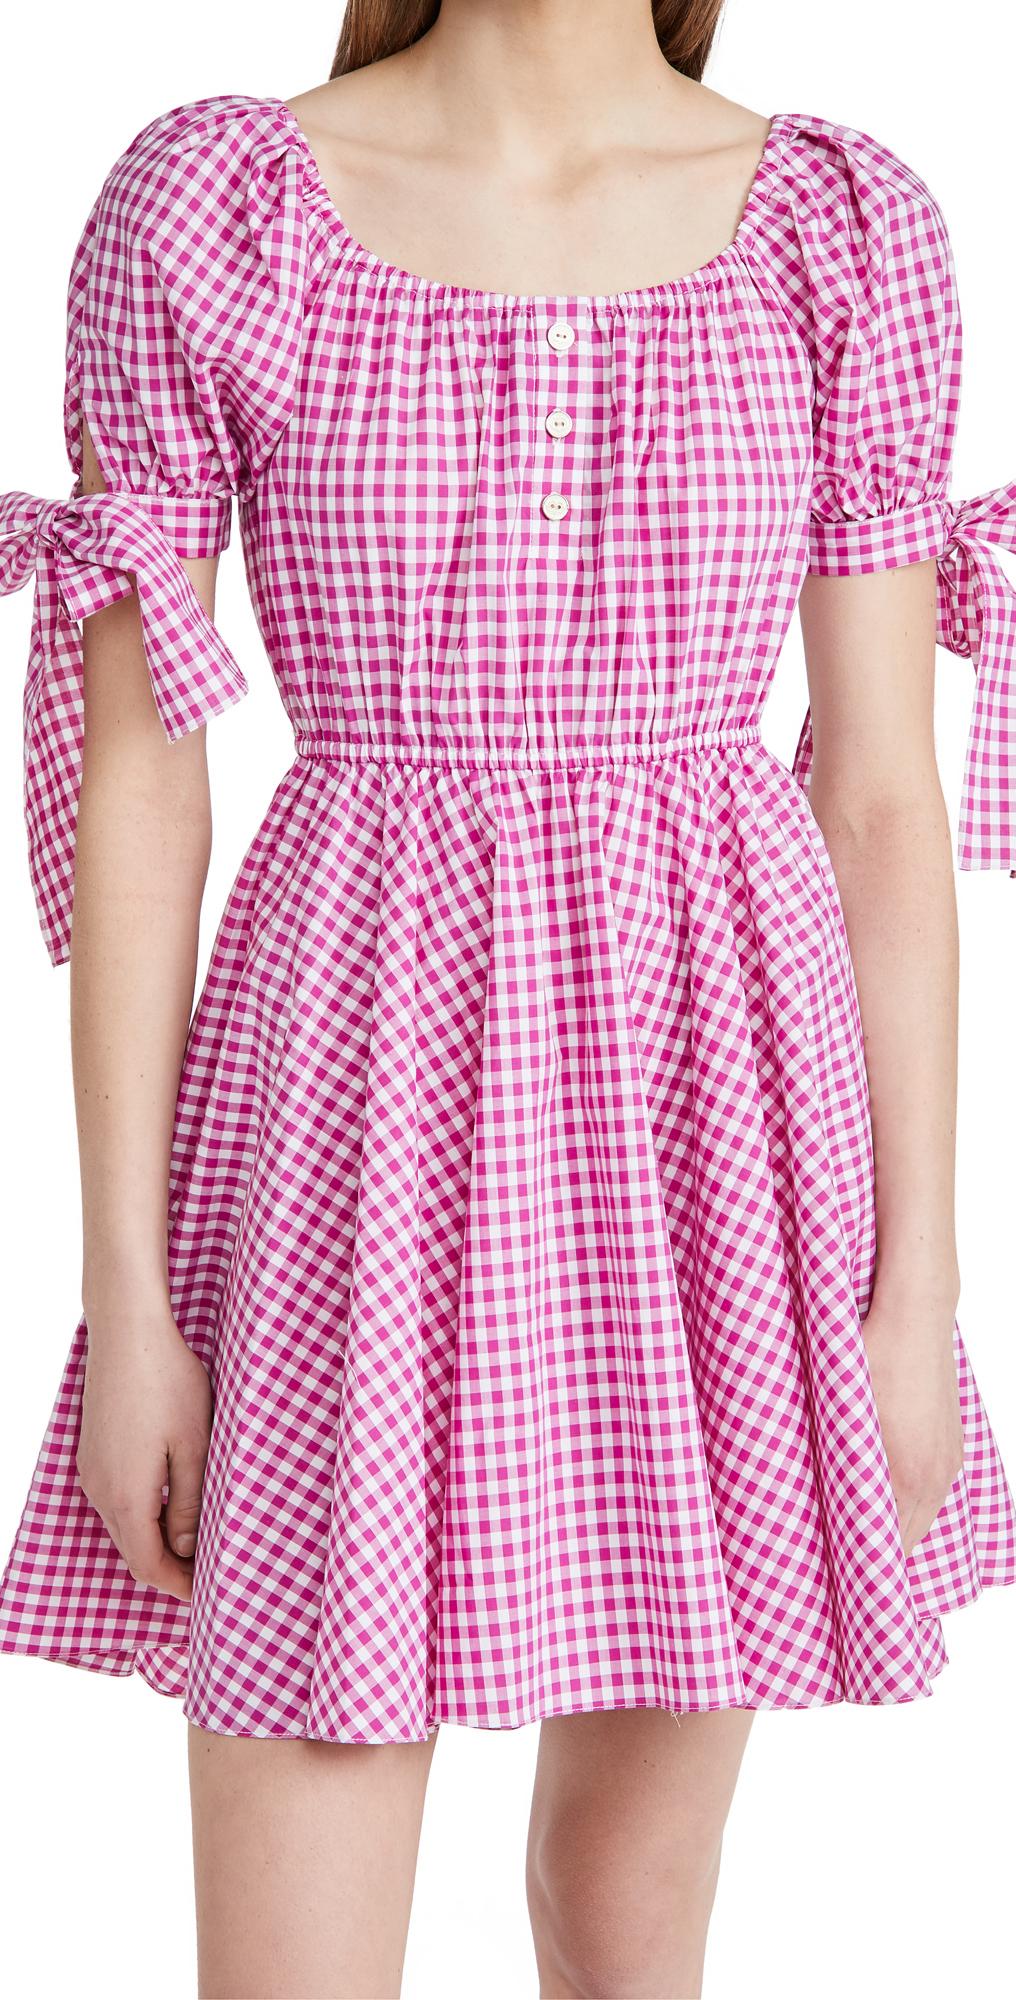 Caroline Constas Bardot Dress